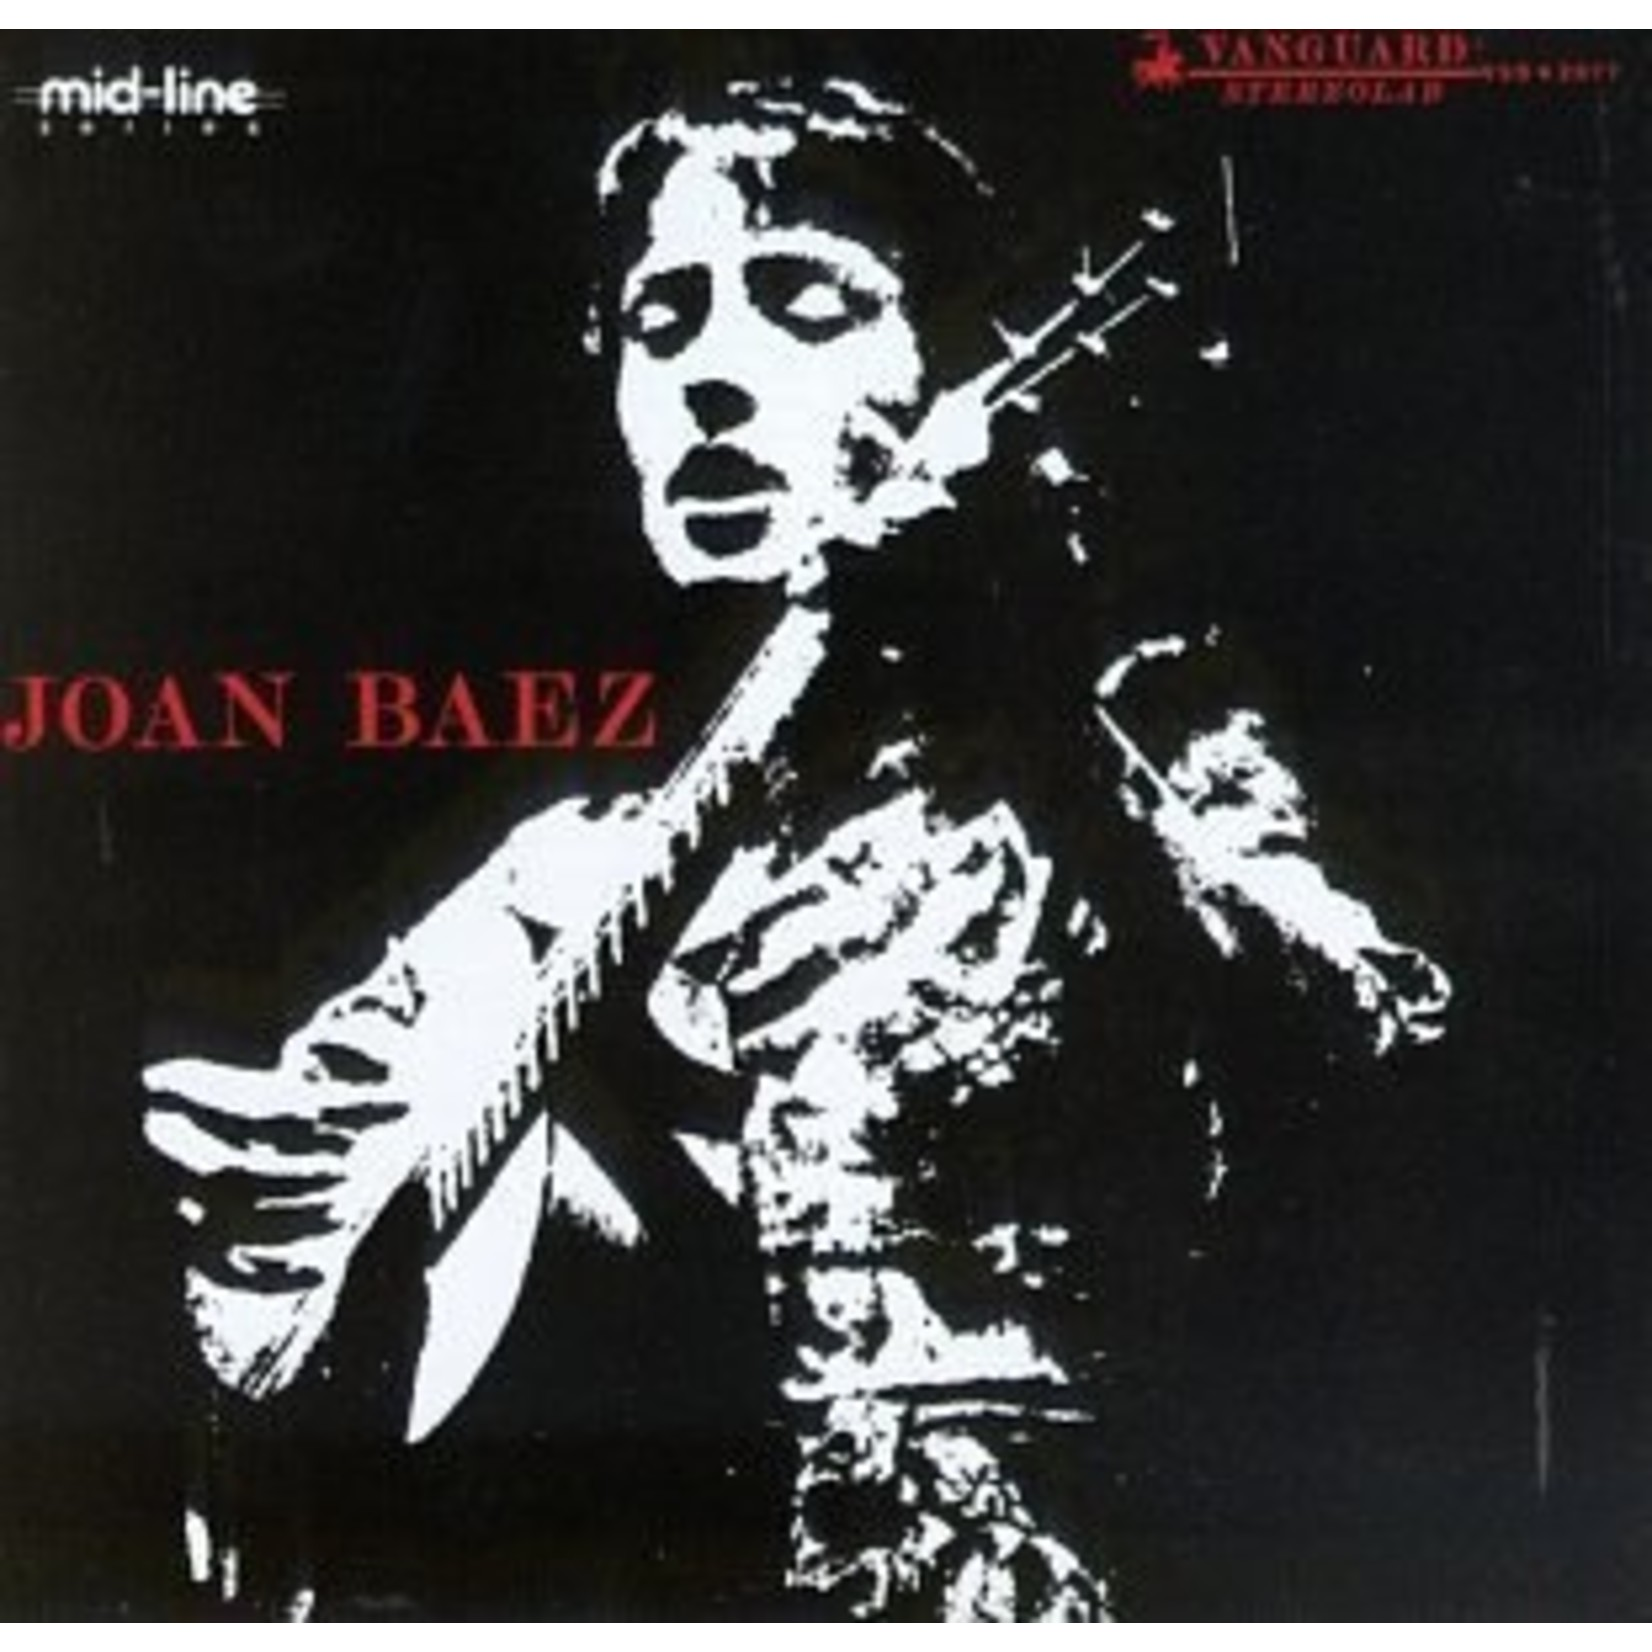 [New] Baez, Joan: self-titled